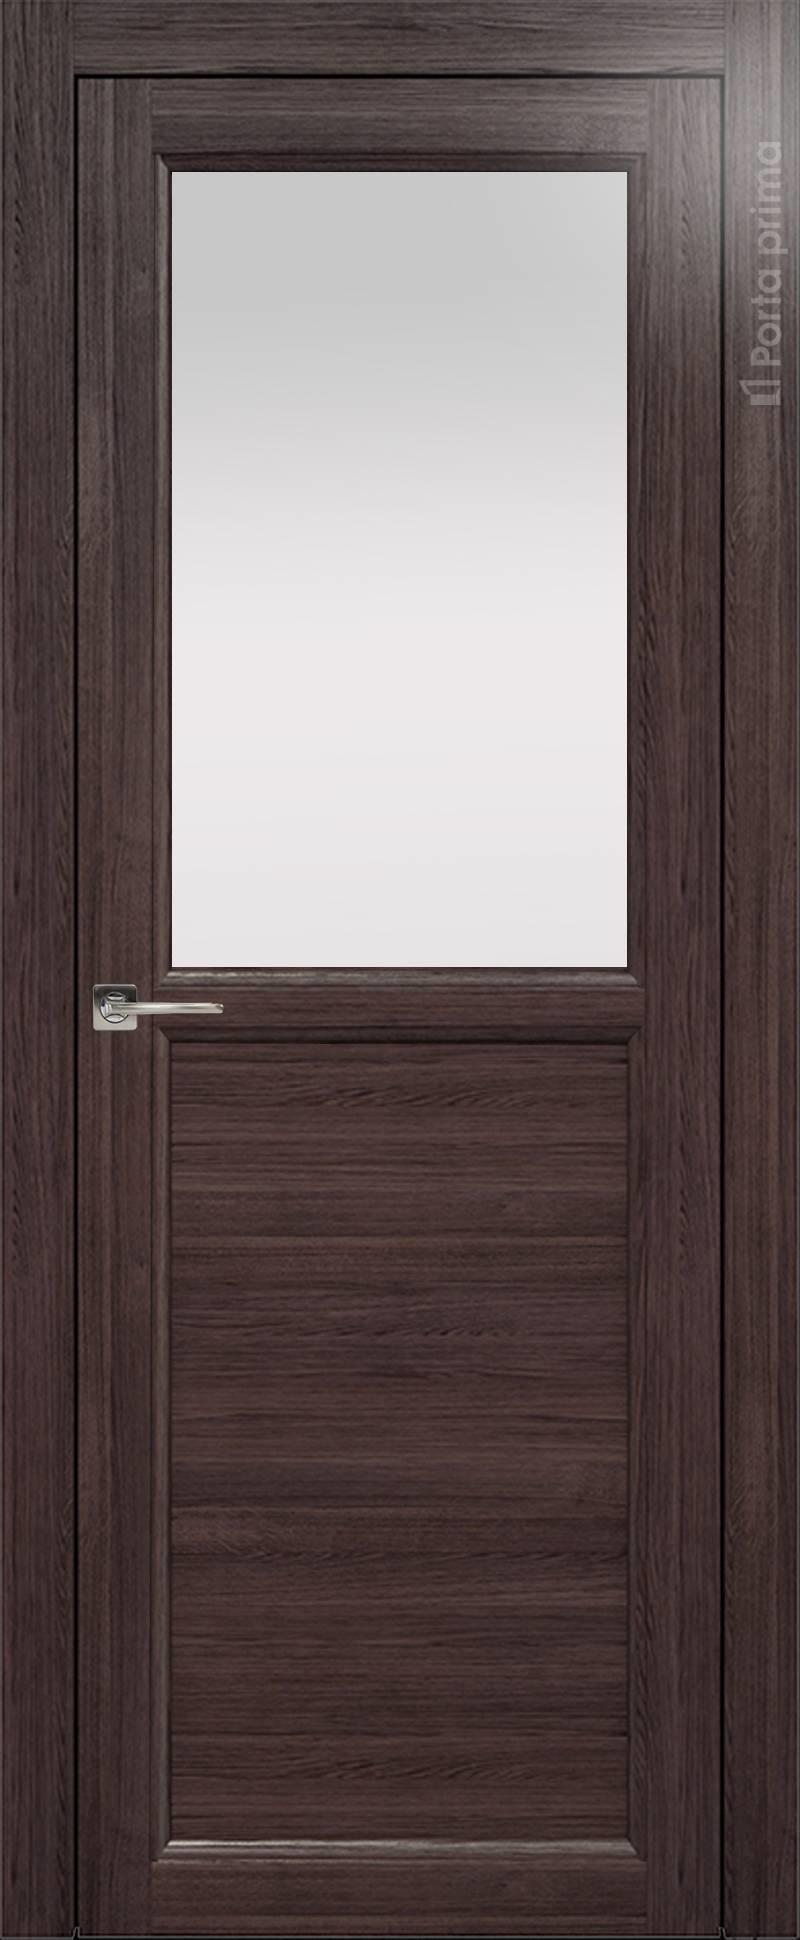 Sorrento-R Б1 цвет - Венге Нуар Со стеклом (ДО)